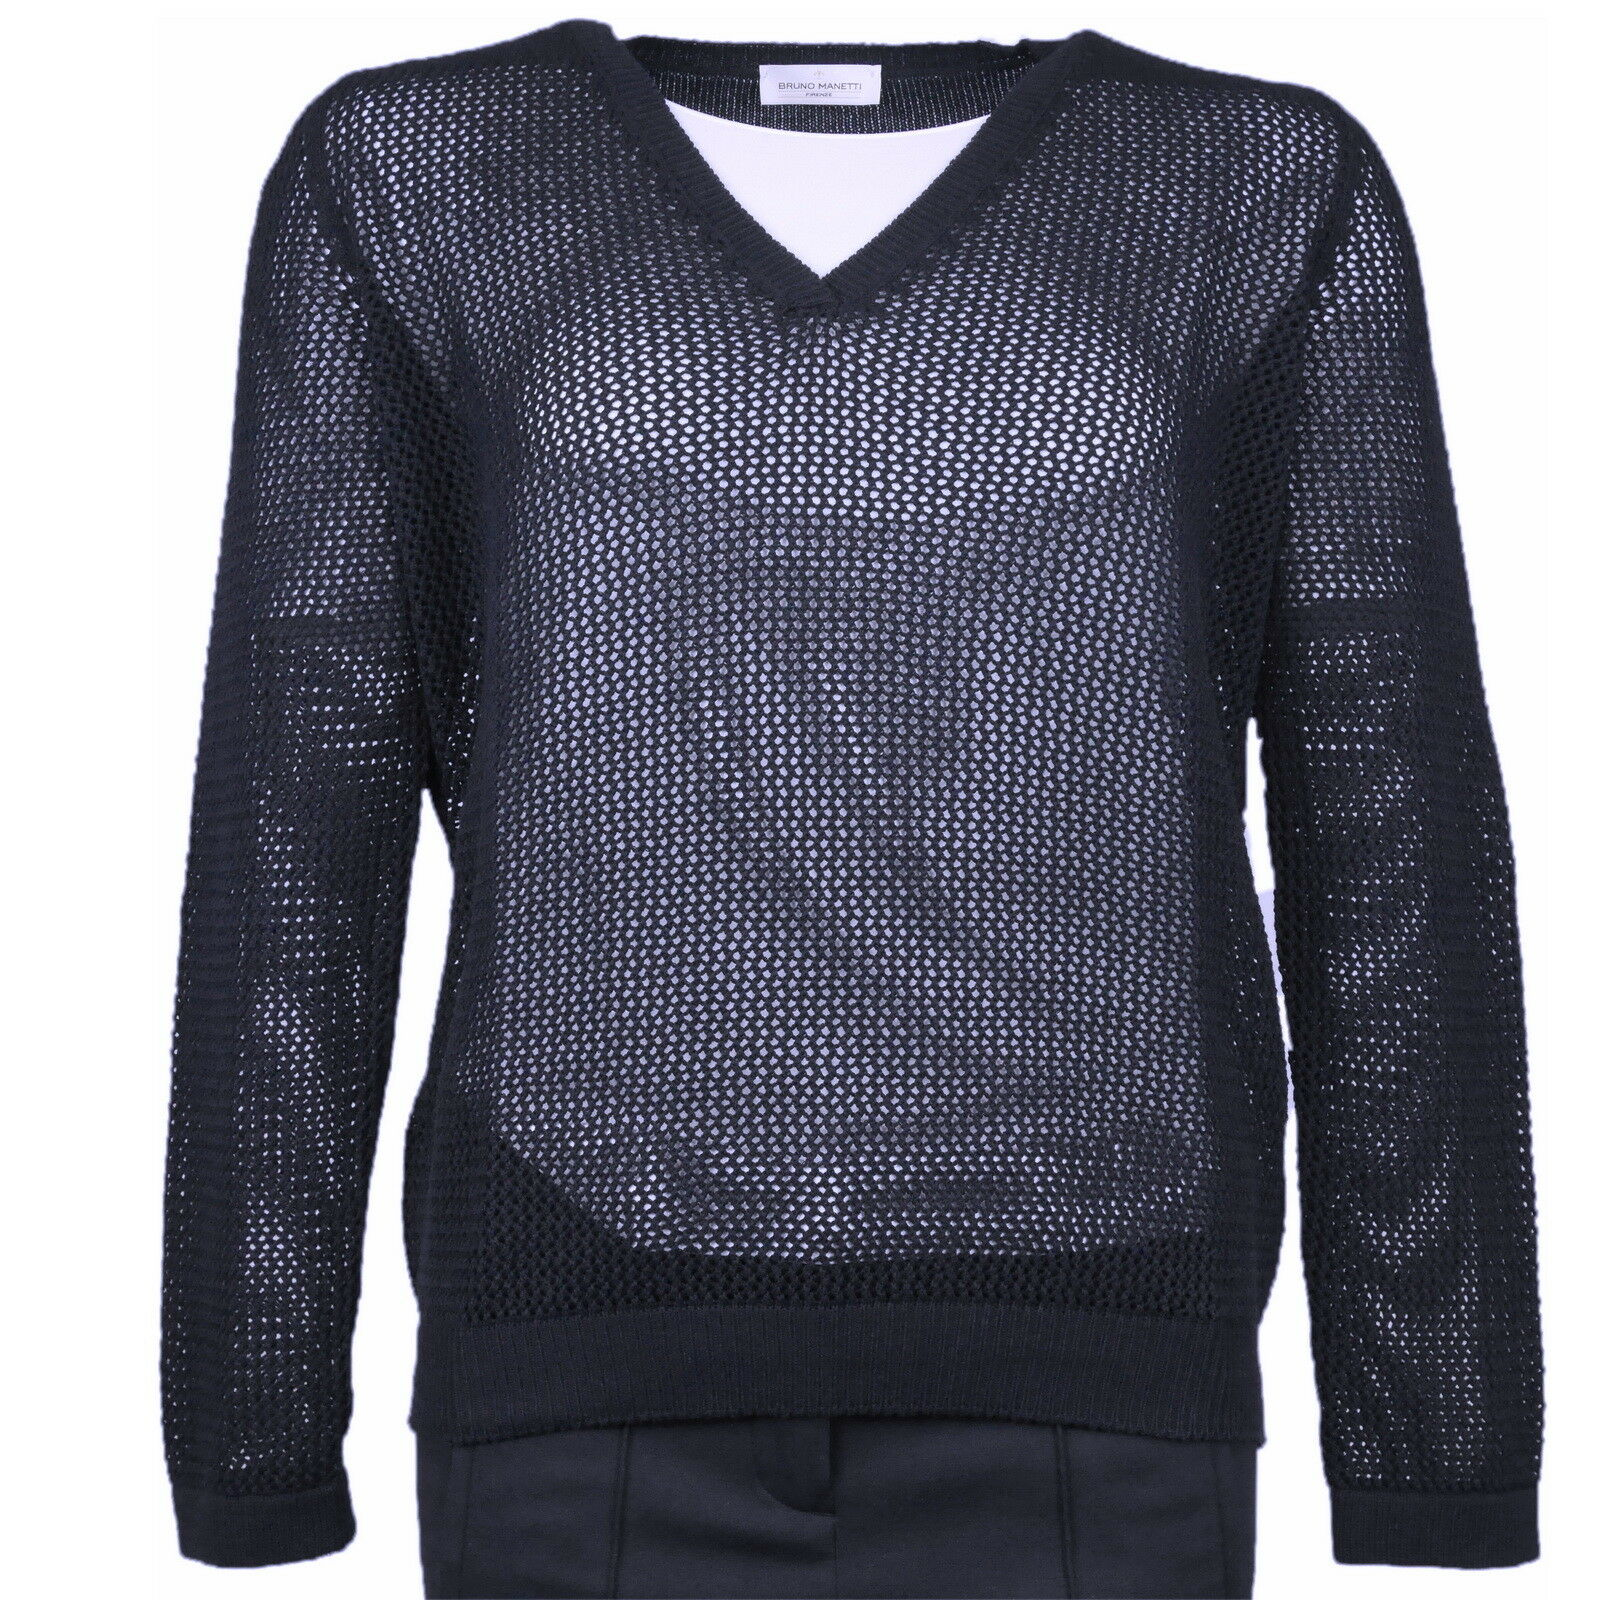 Versus VERSACE Sweater Pullover XL SHIRT Gianni Sweater VERSACE Maglione Neon Logo grigio Felpa ad923f